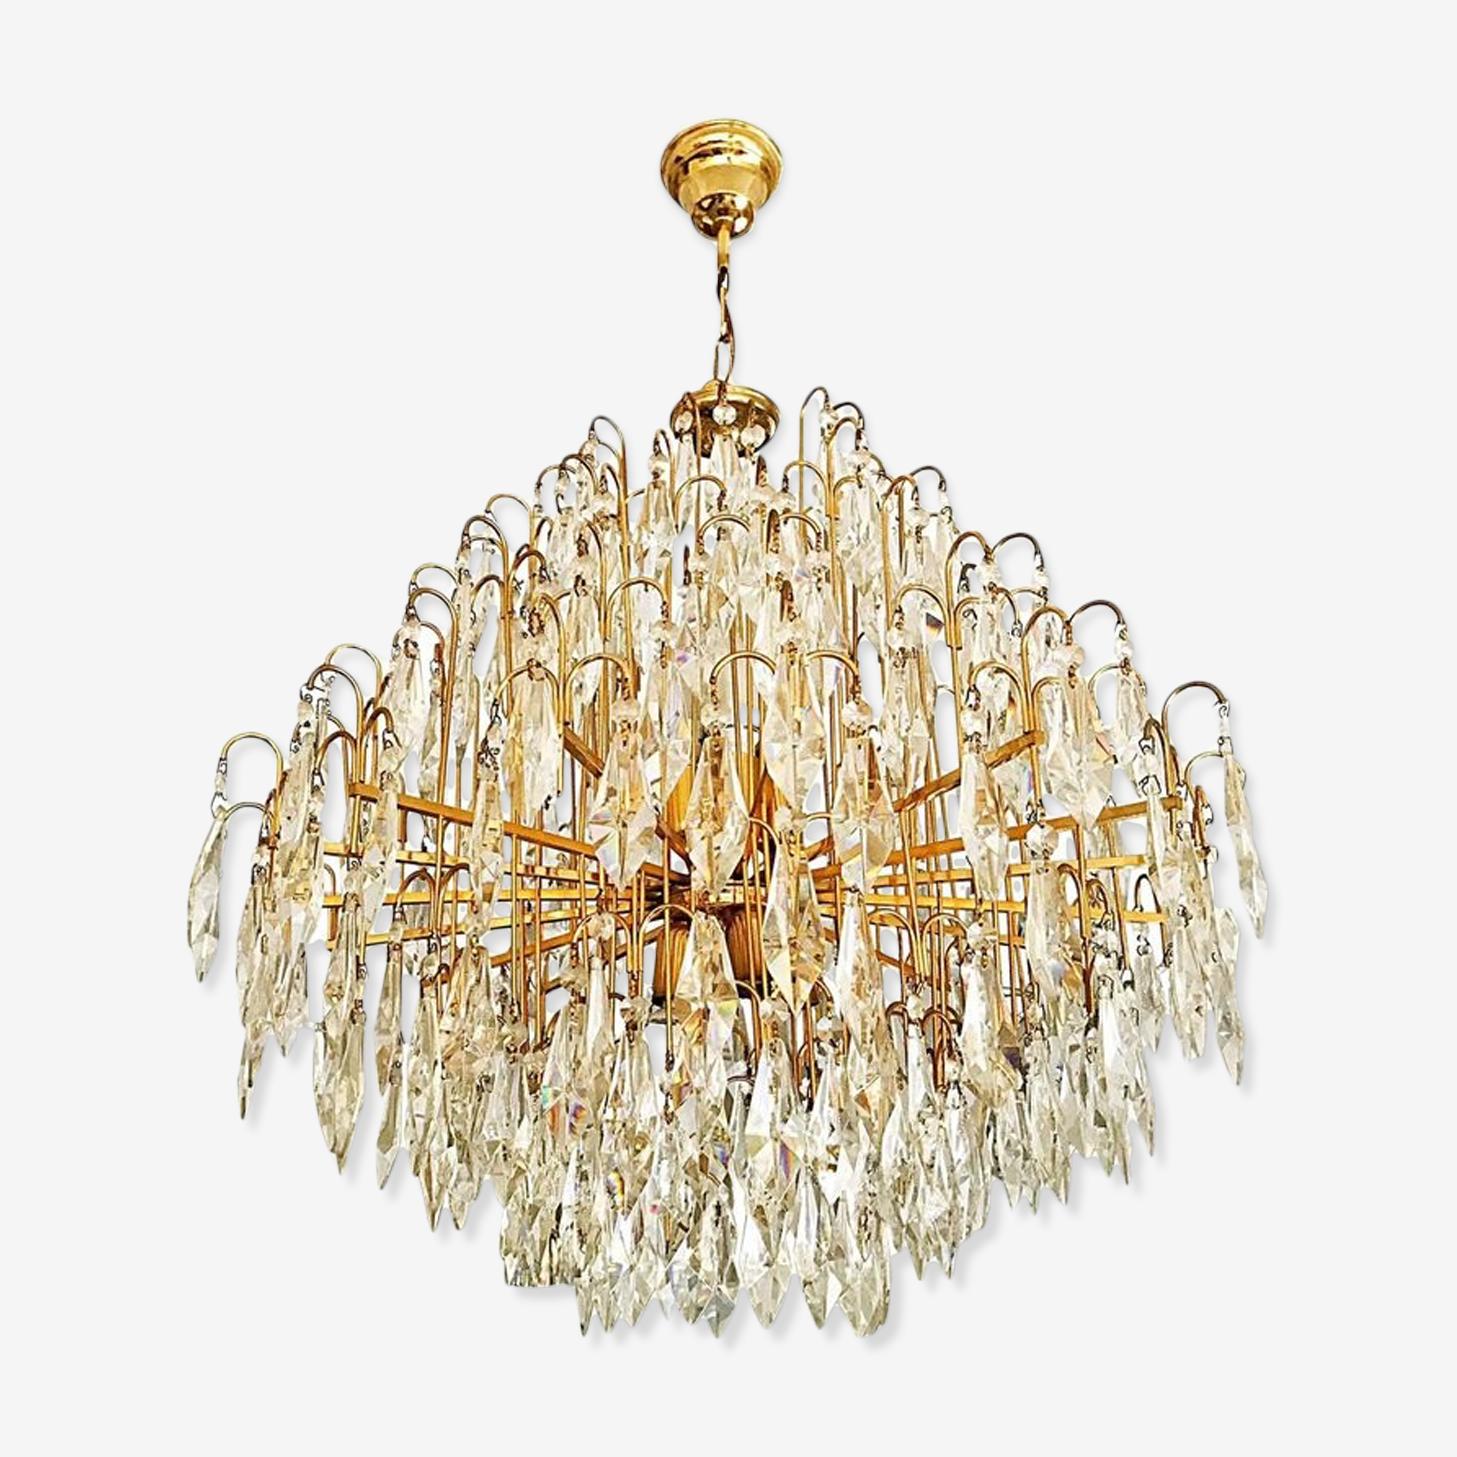 Italian Murano 1970 crystal chandelier